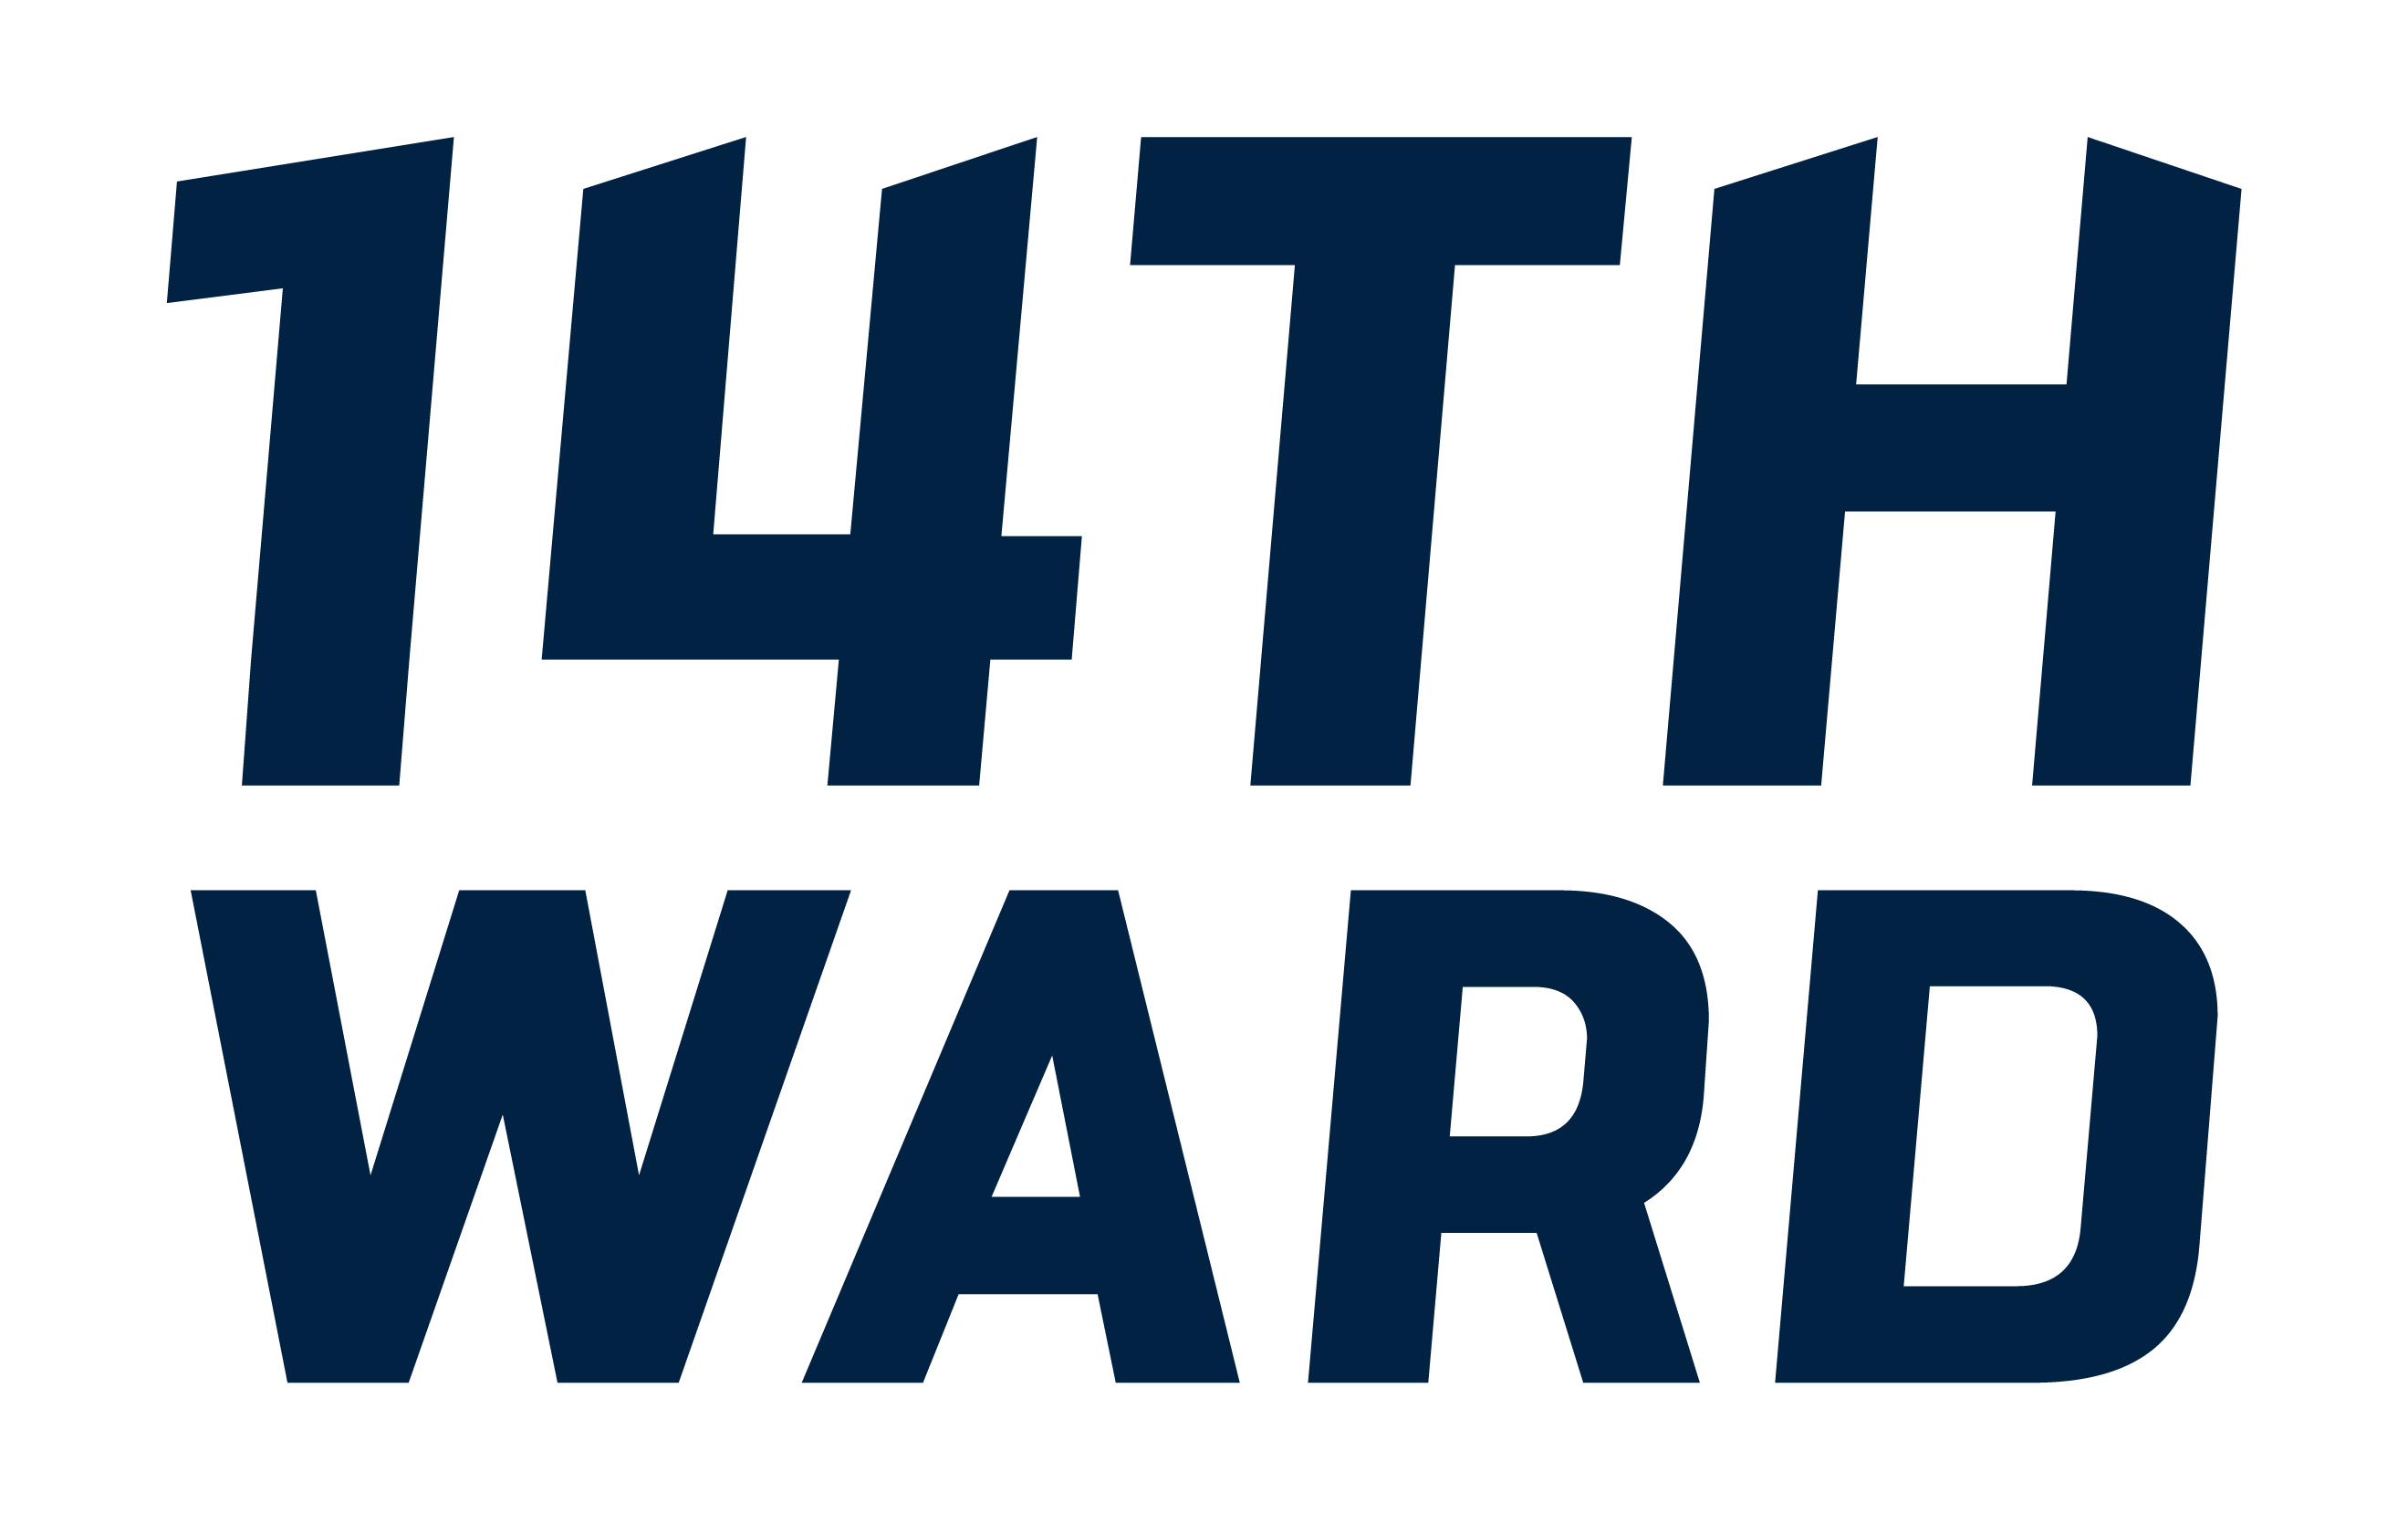 14th ward baseball logo registration